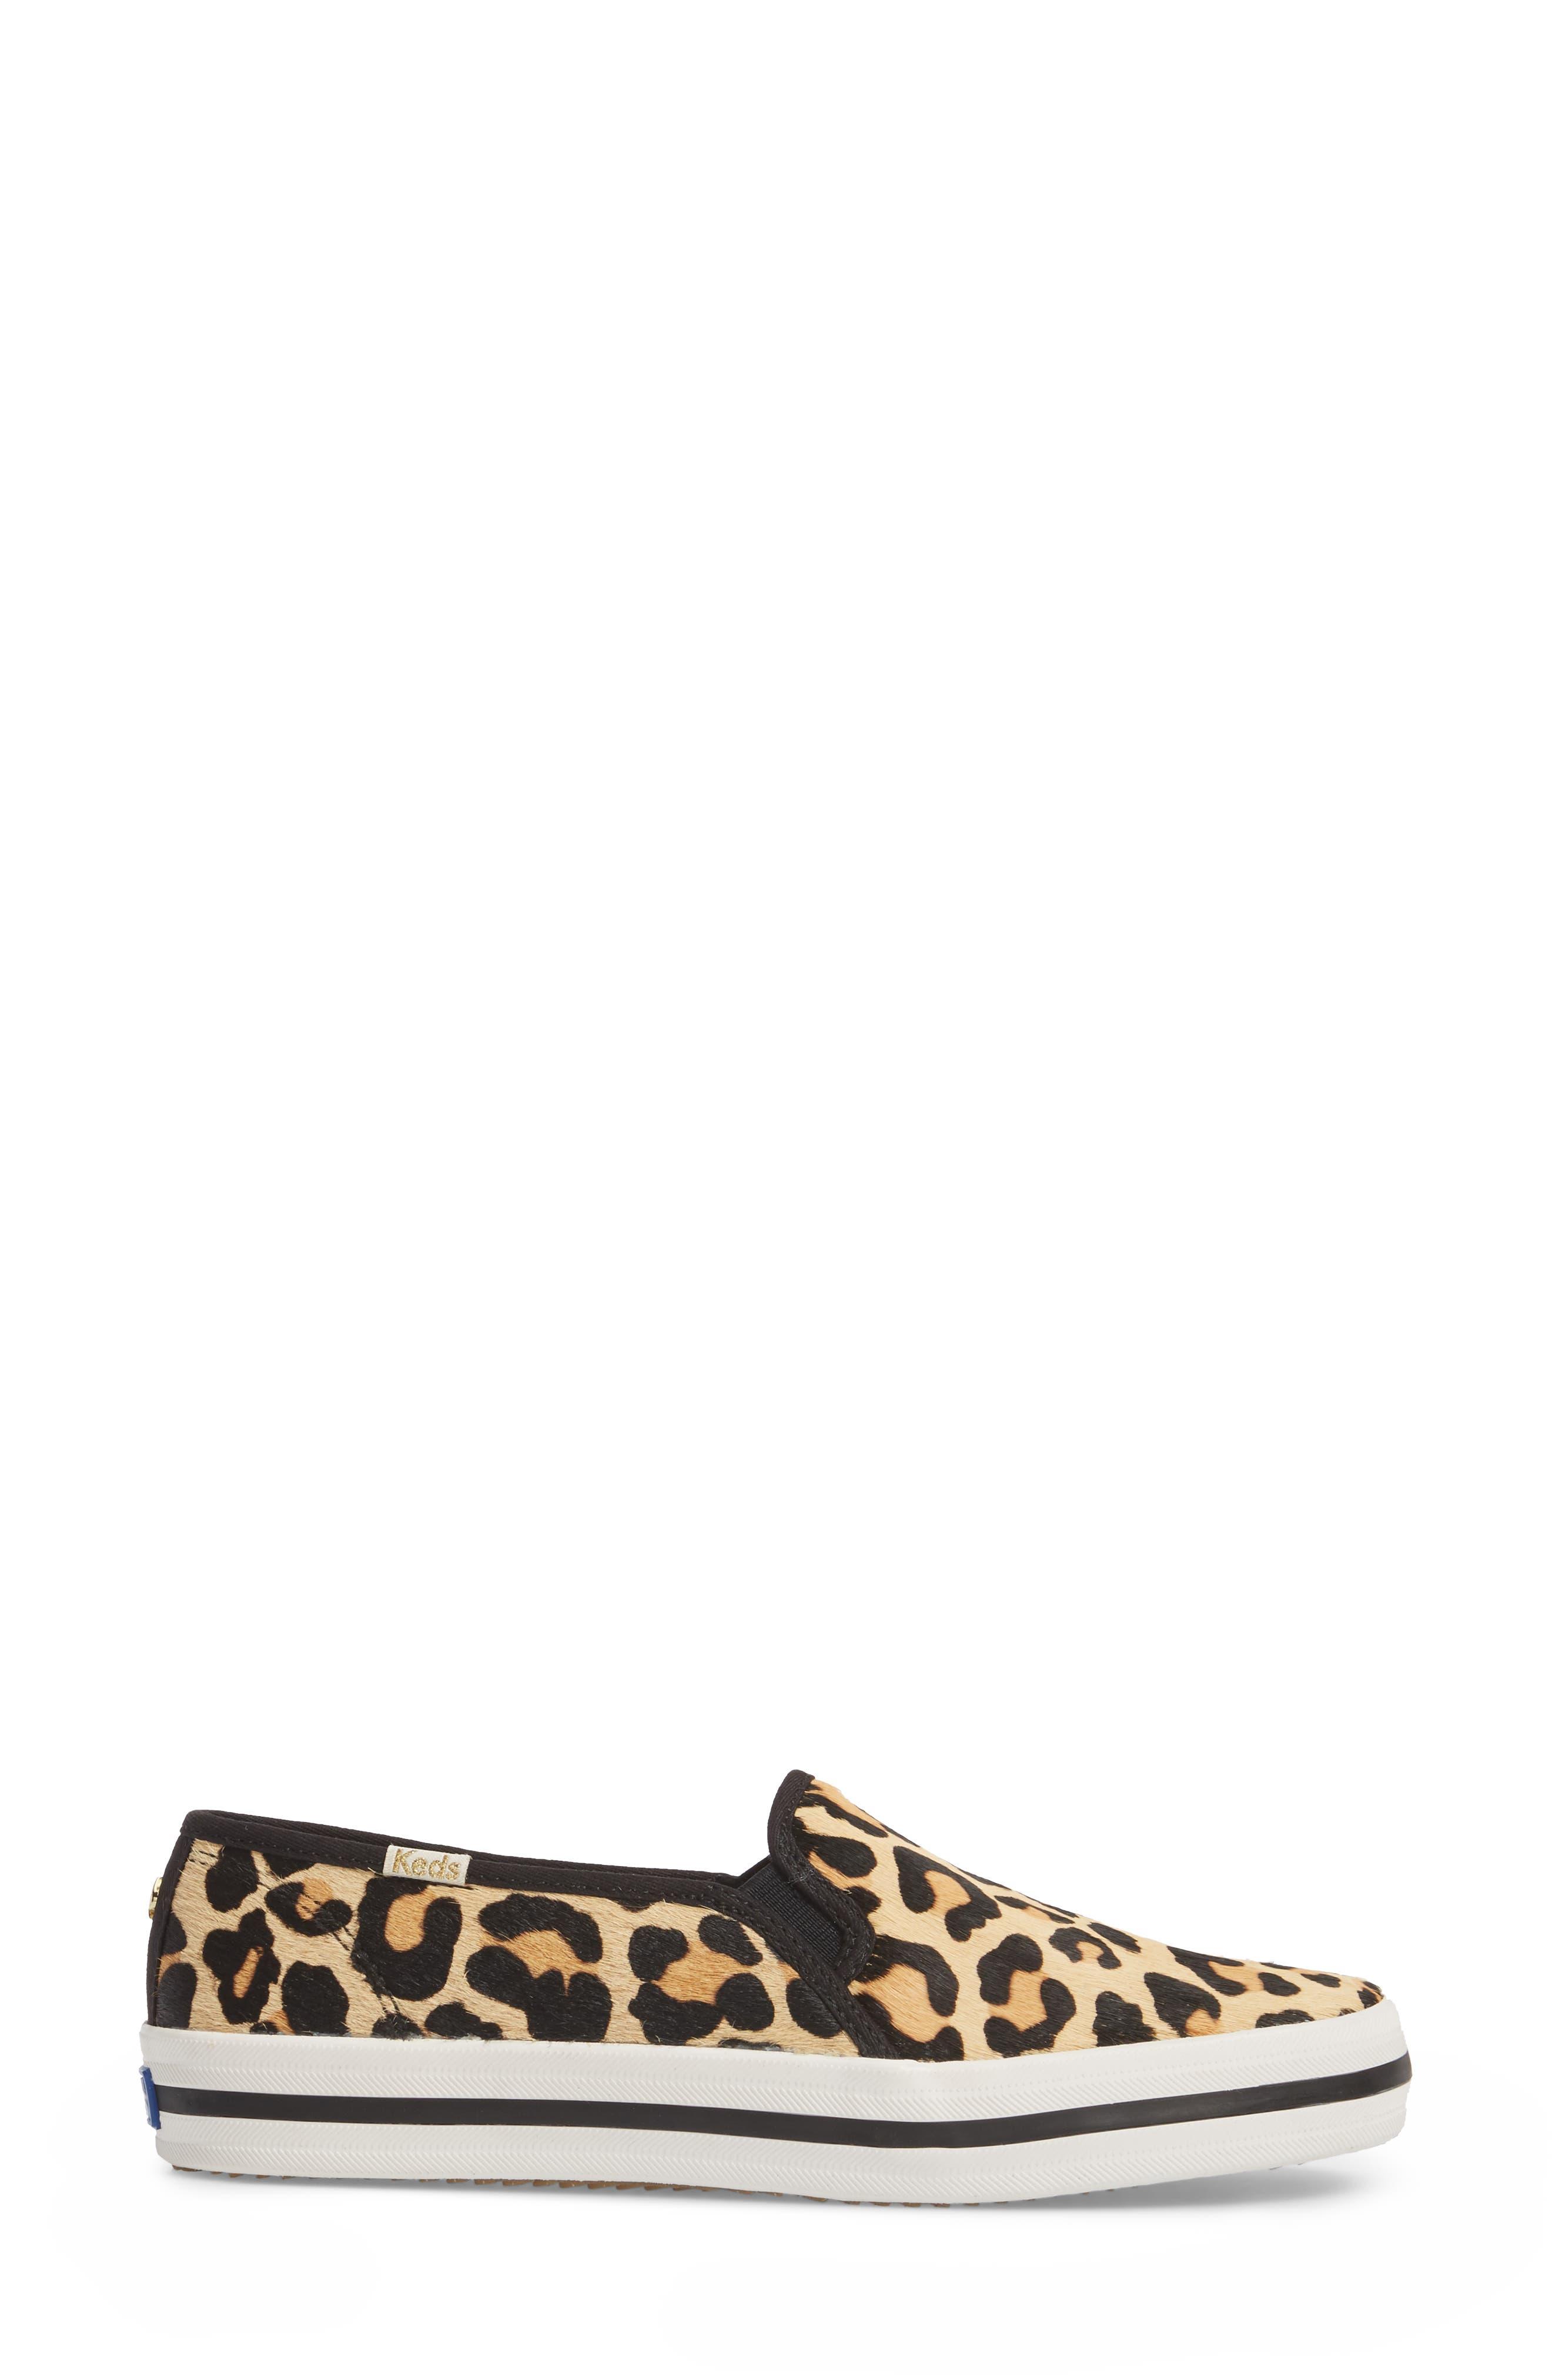 KEDS<SUP>®</SUP> FOR KATE SPADE NEW YORK, Keds<sup>®</sup> x kate spade Double Decker Slip-On Sneaker, Alternate thumbnail 3, color, TAN PONY HAIR